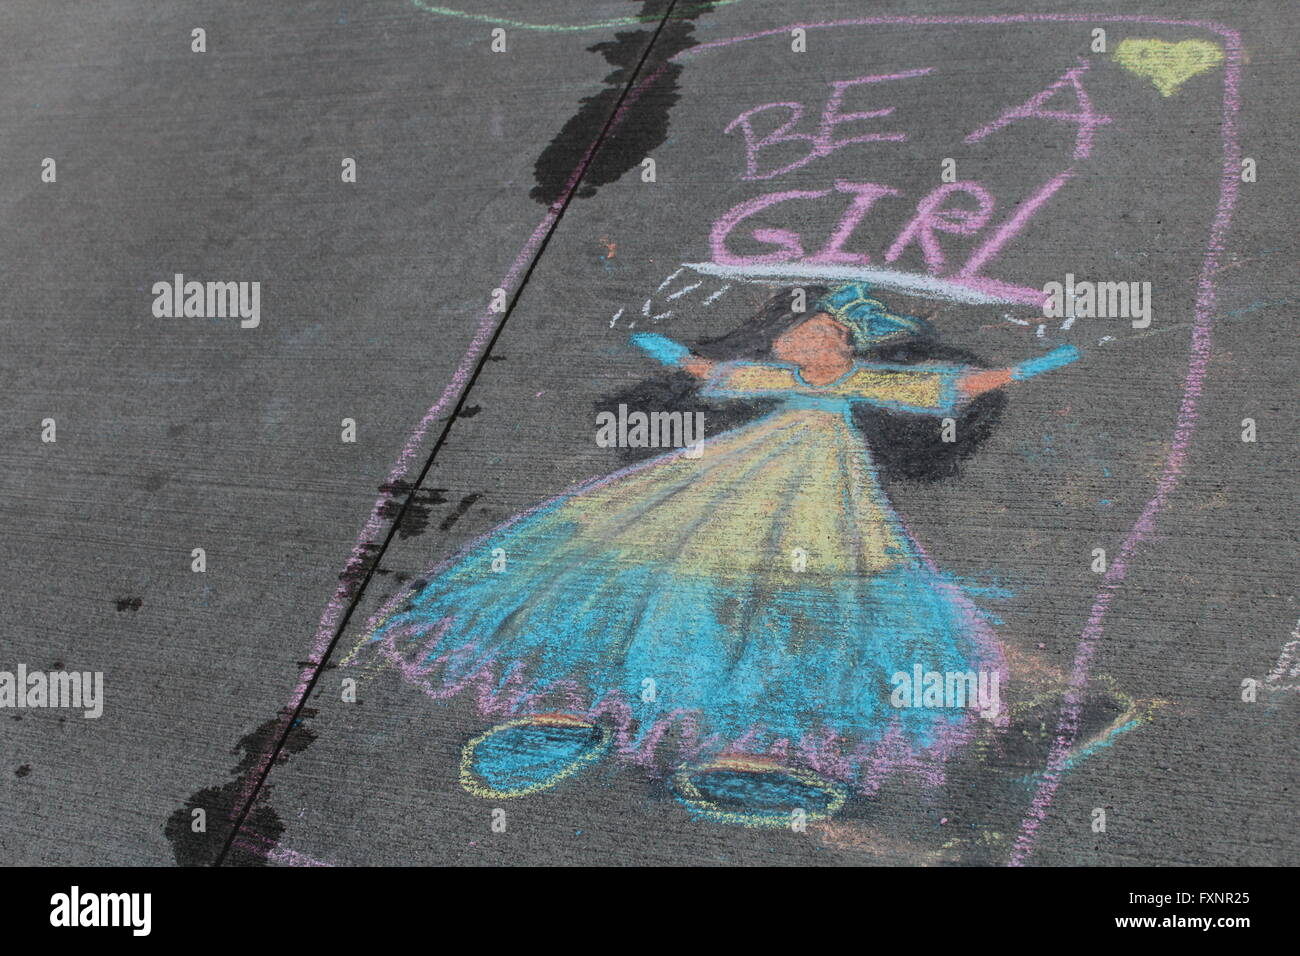 chalk drawing of girl on sidewalk - Stock Image